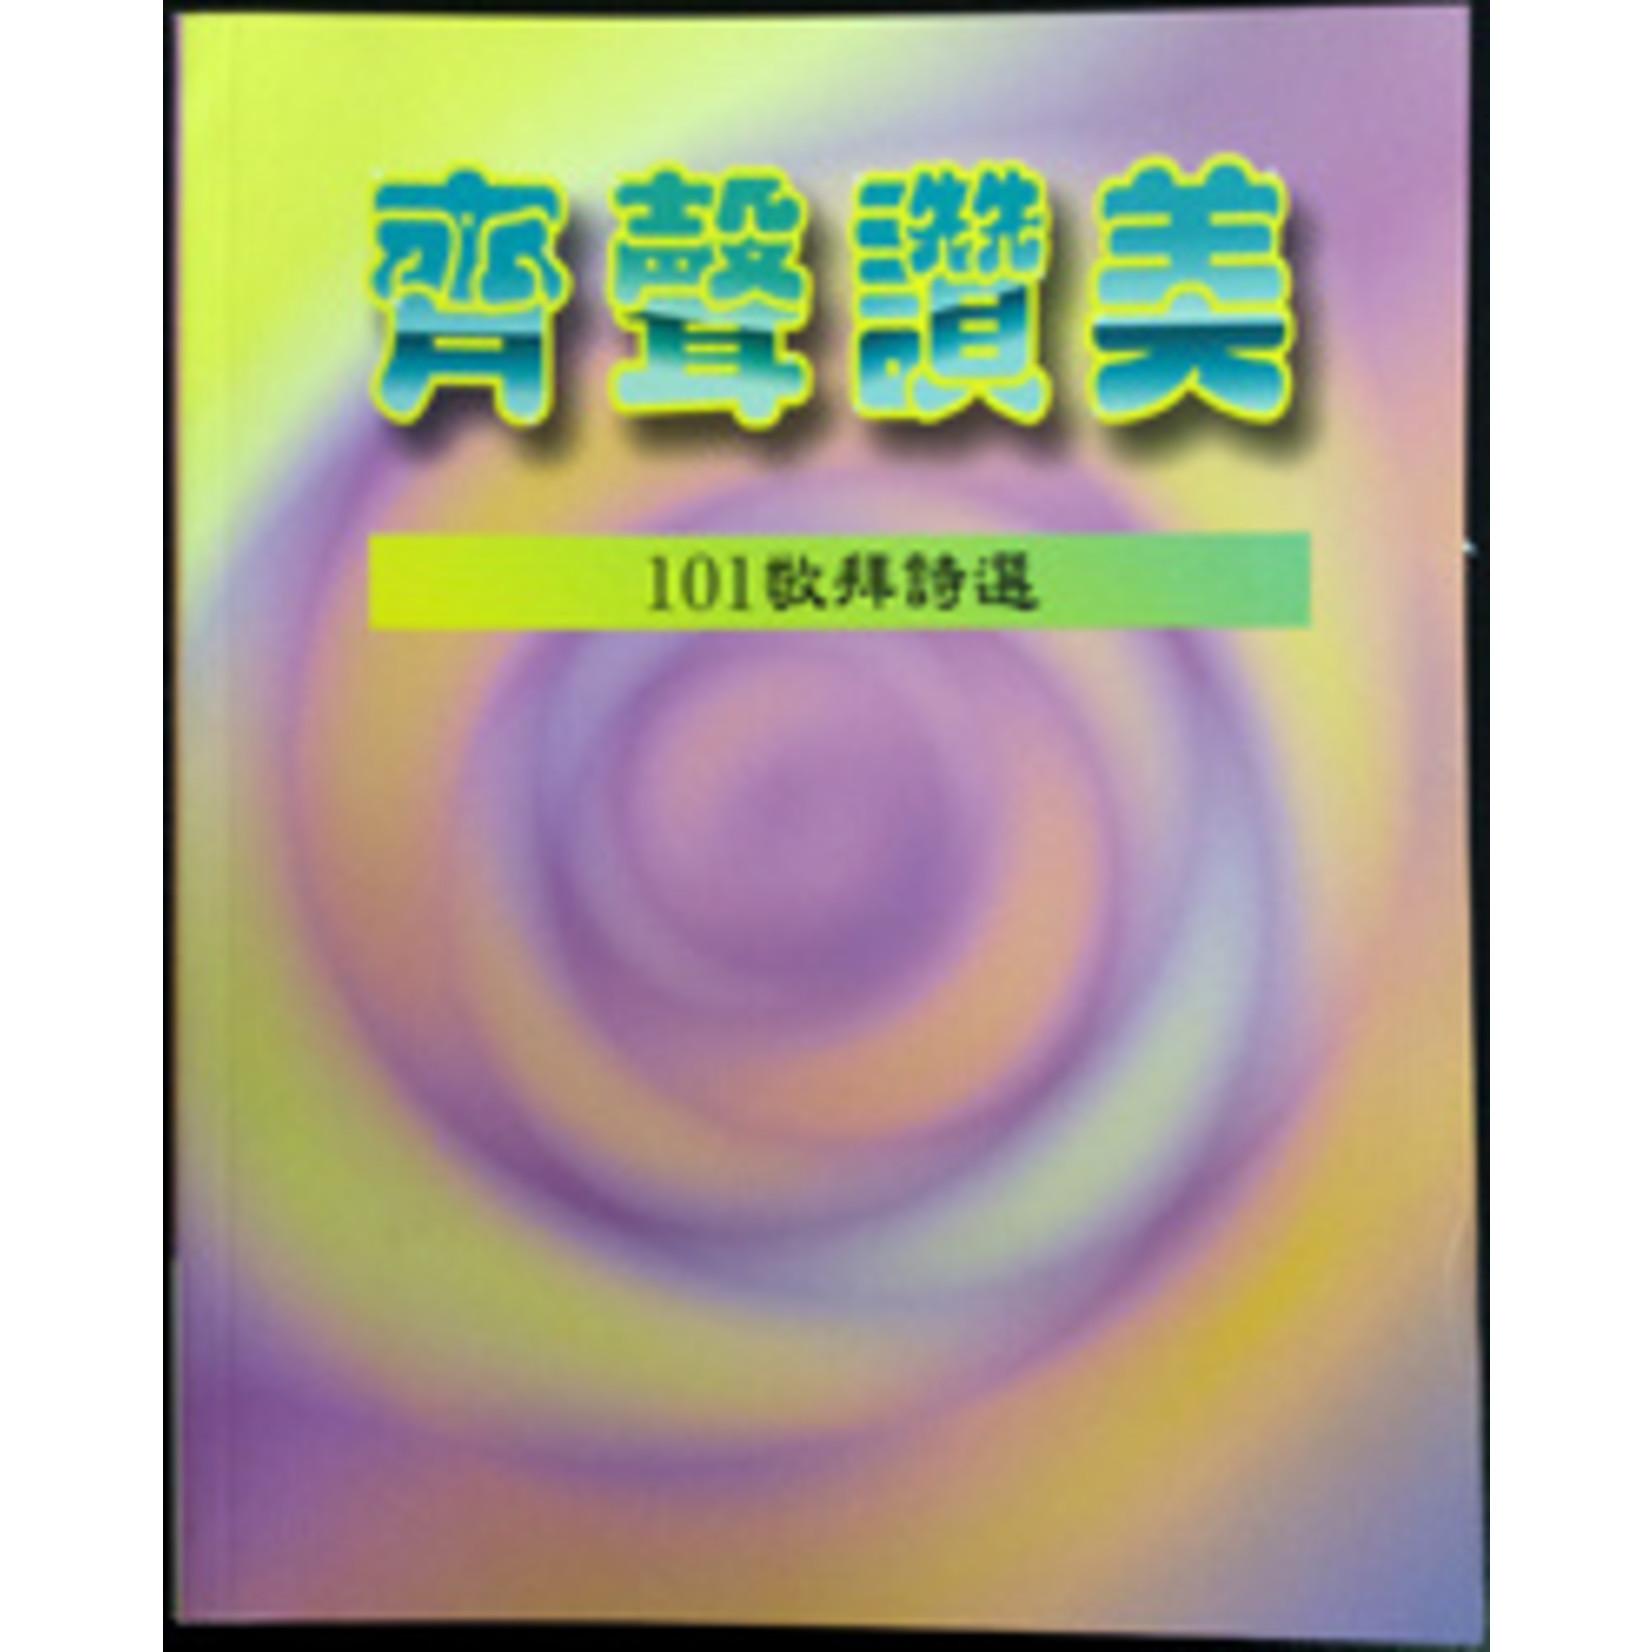 台福傳播中心 Evangelical Formosan Church Communication Center 齊聲讚美:101敬拜詩選